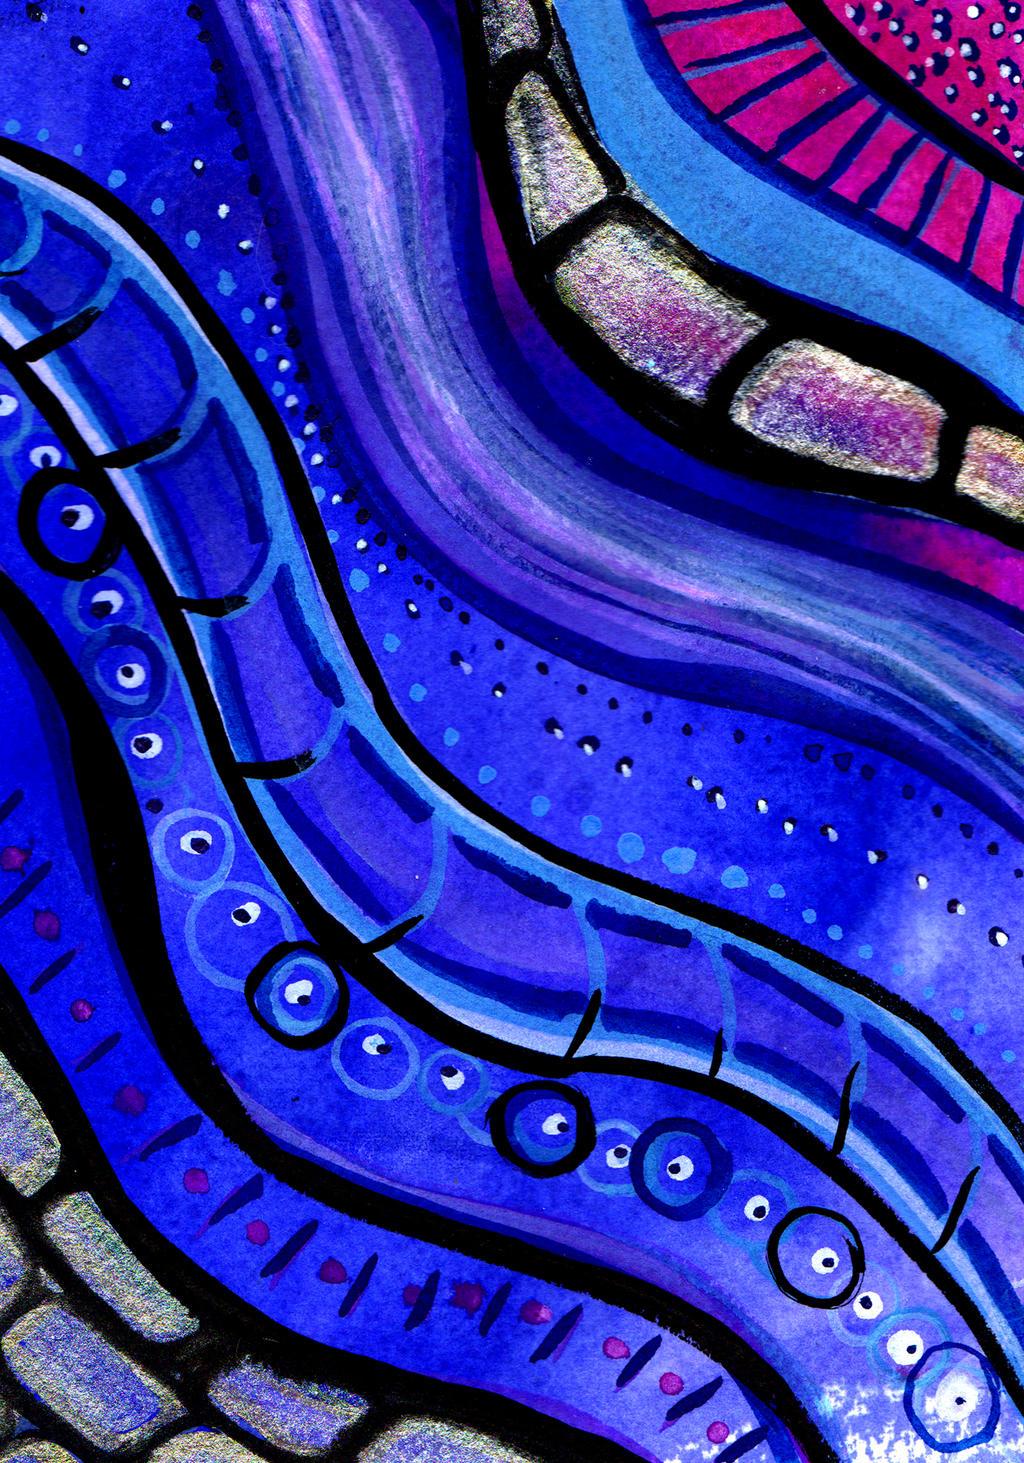 Warped Space by jenthestrawberry